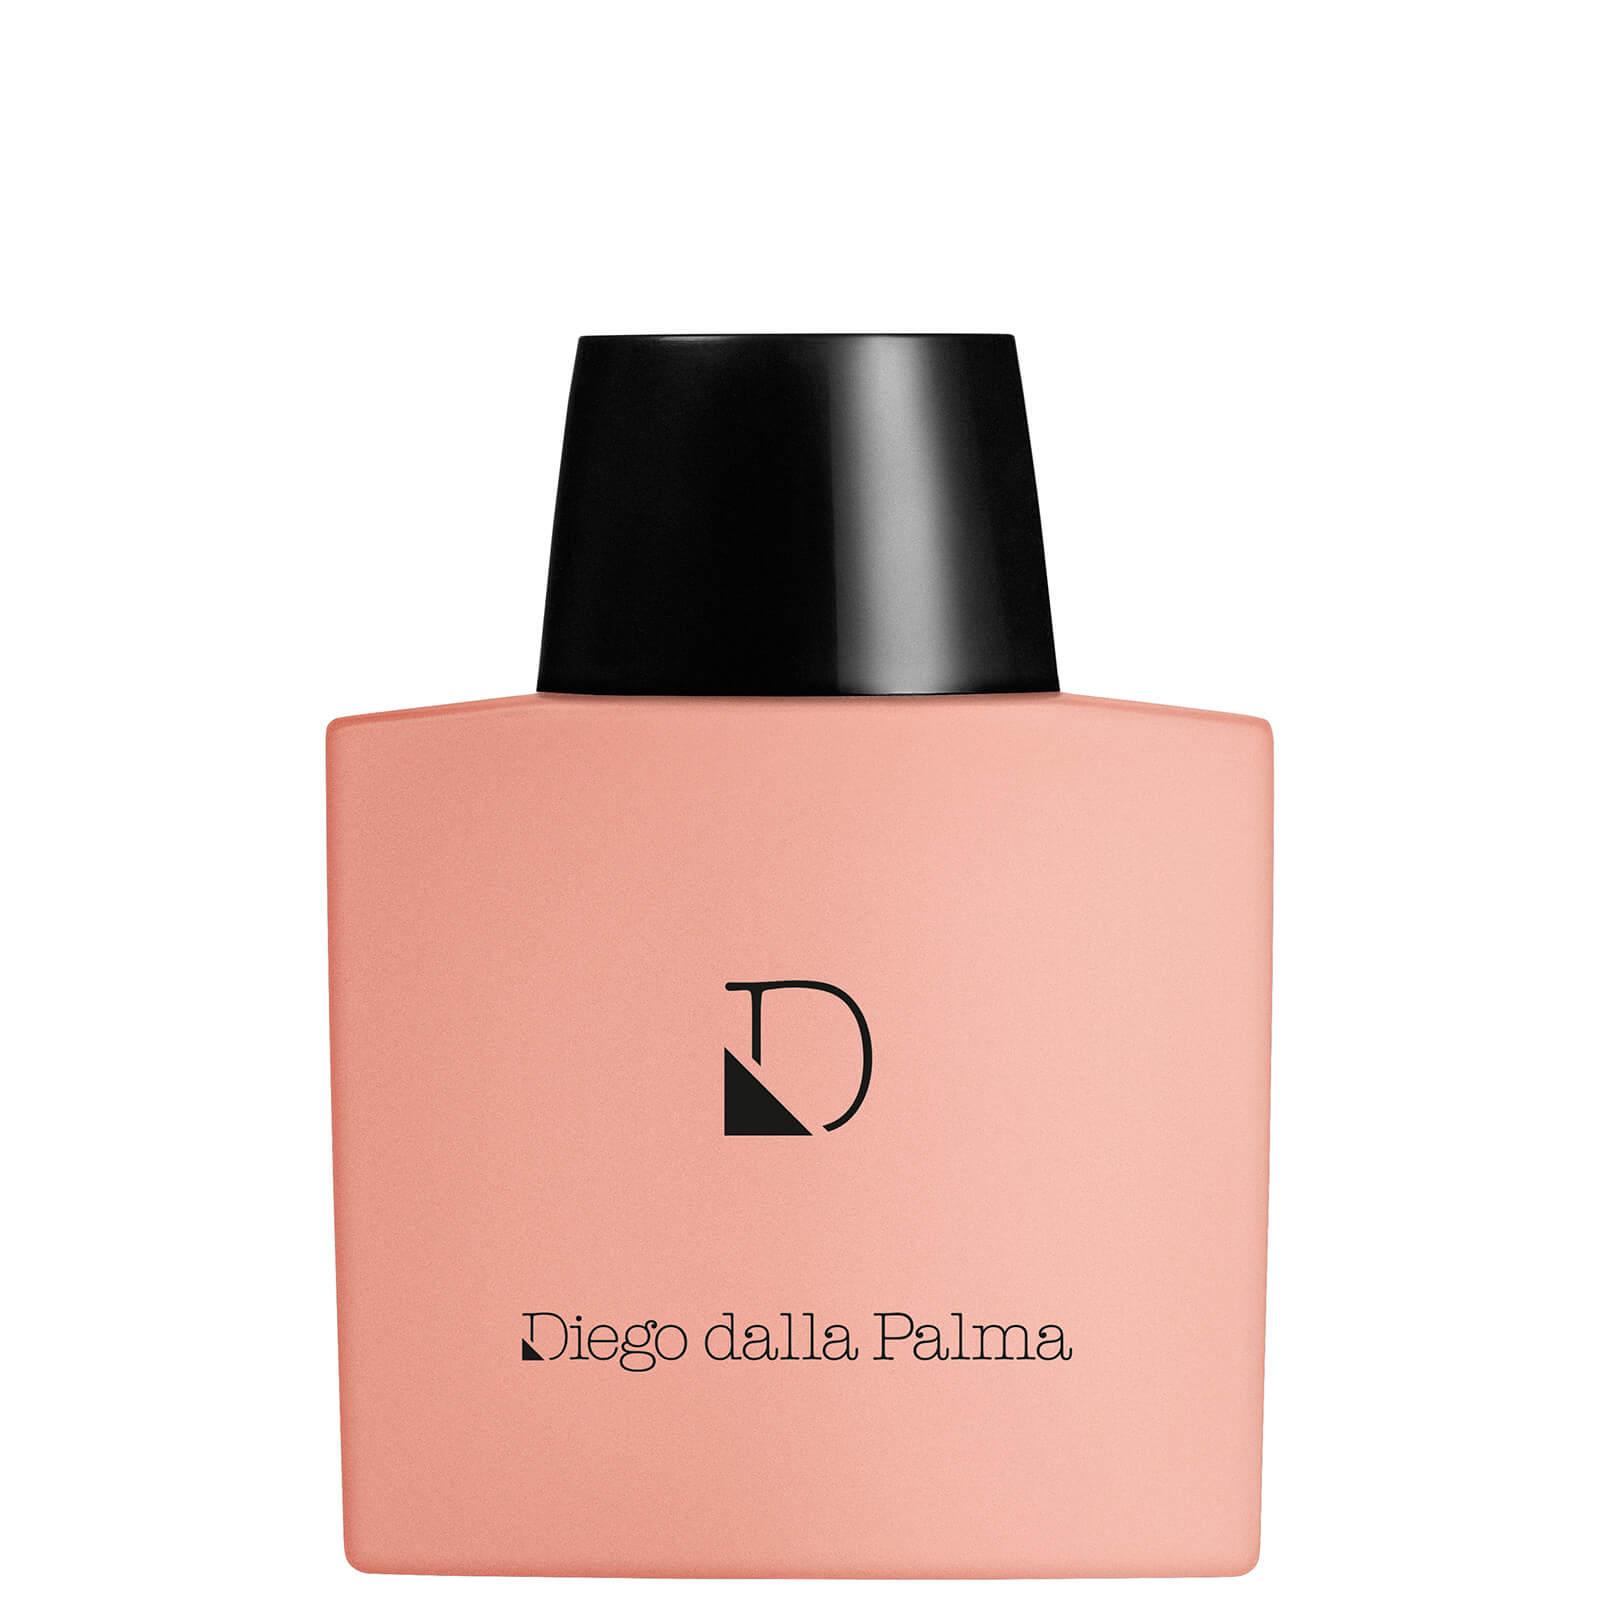 Diego Dalla Palma My Second Skin Liquid Complexion Enhancer - Light 30ml